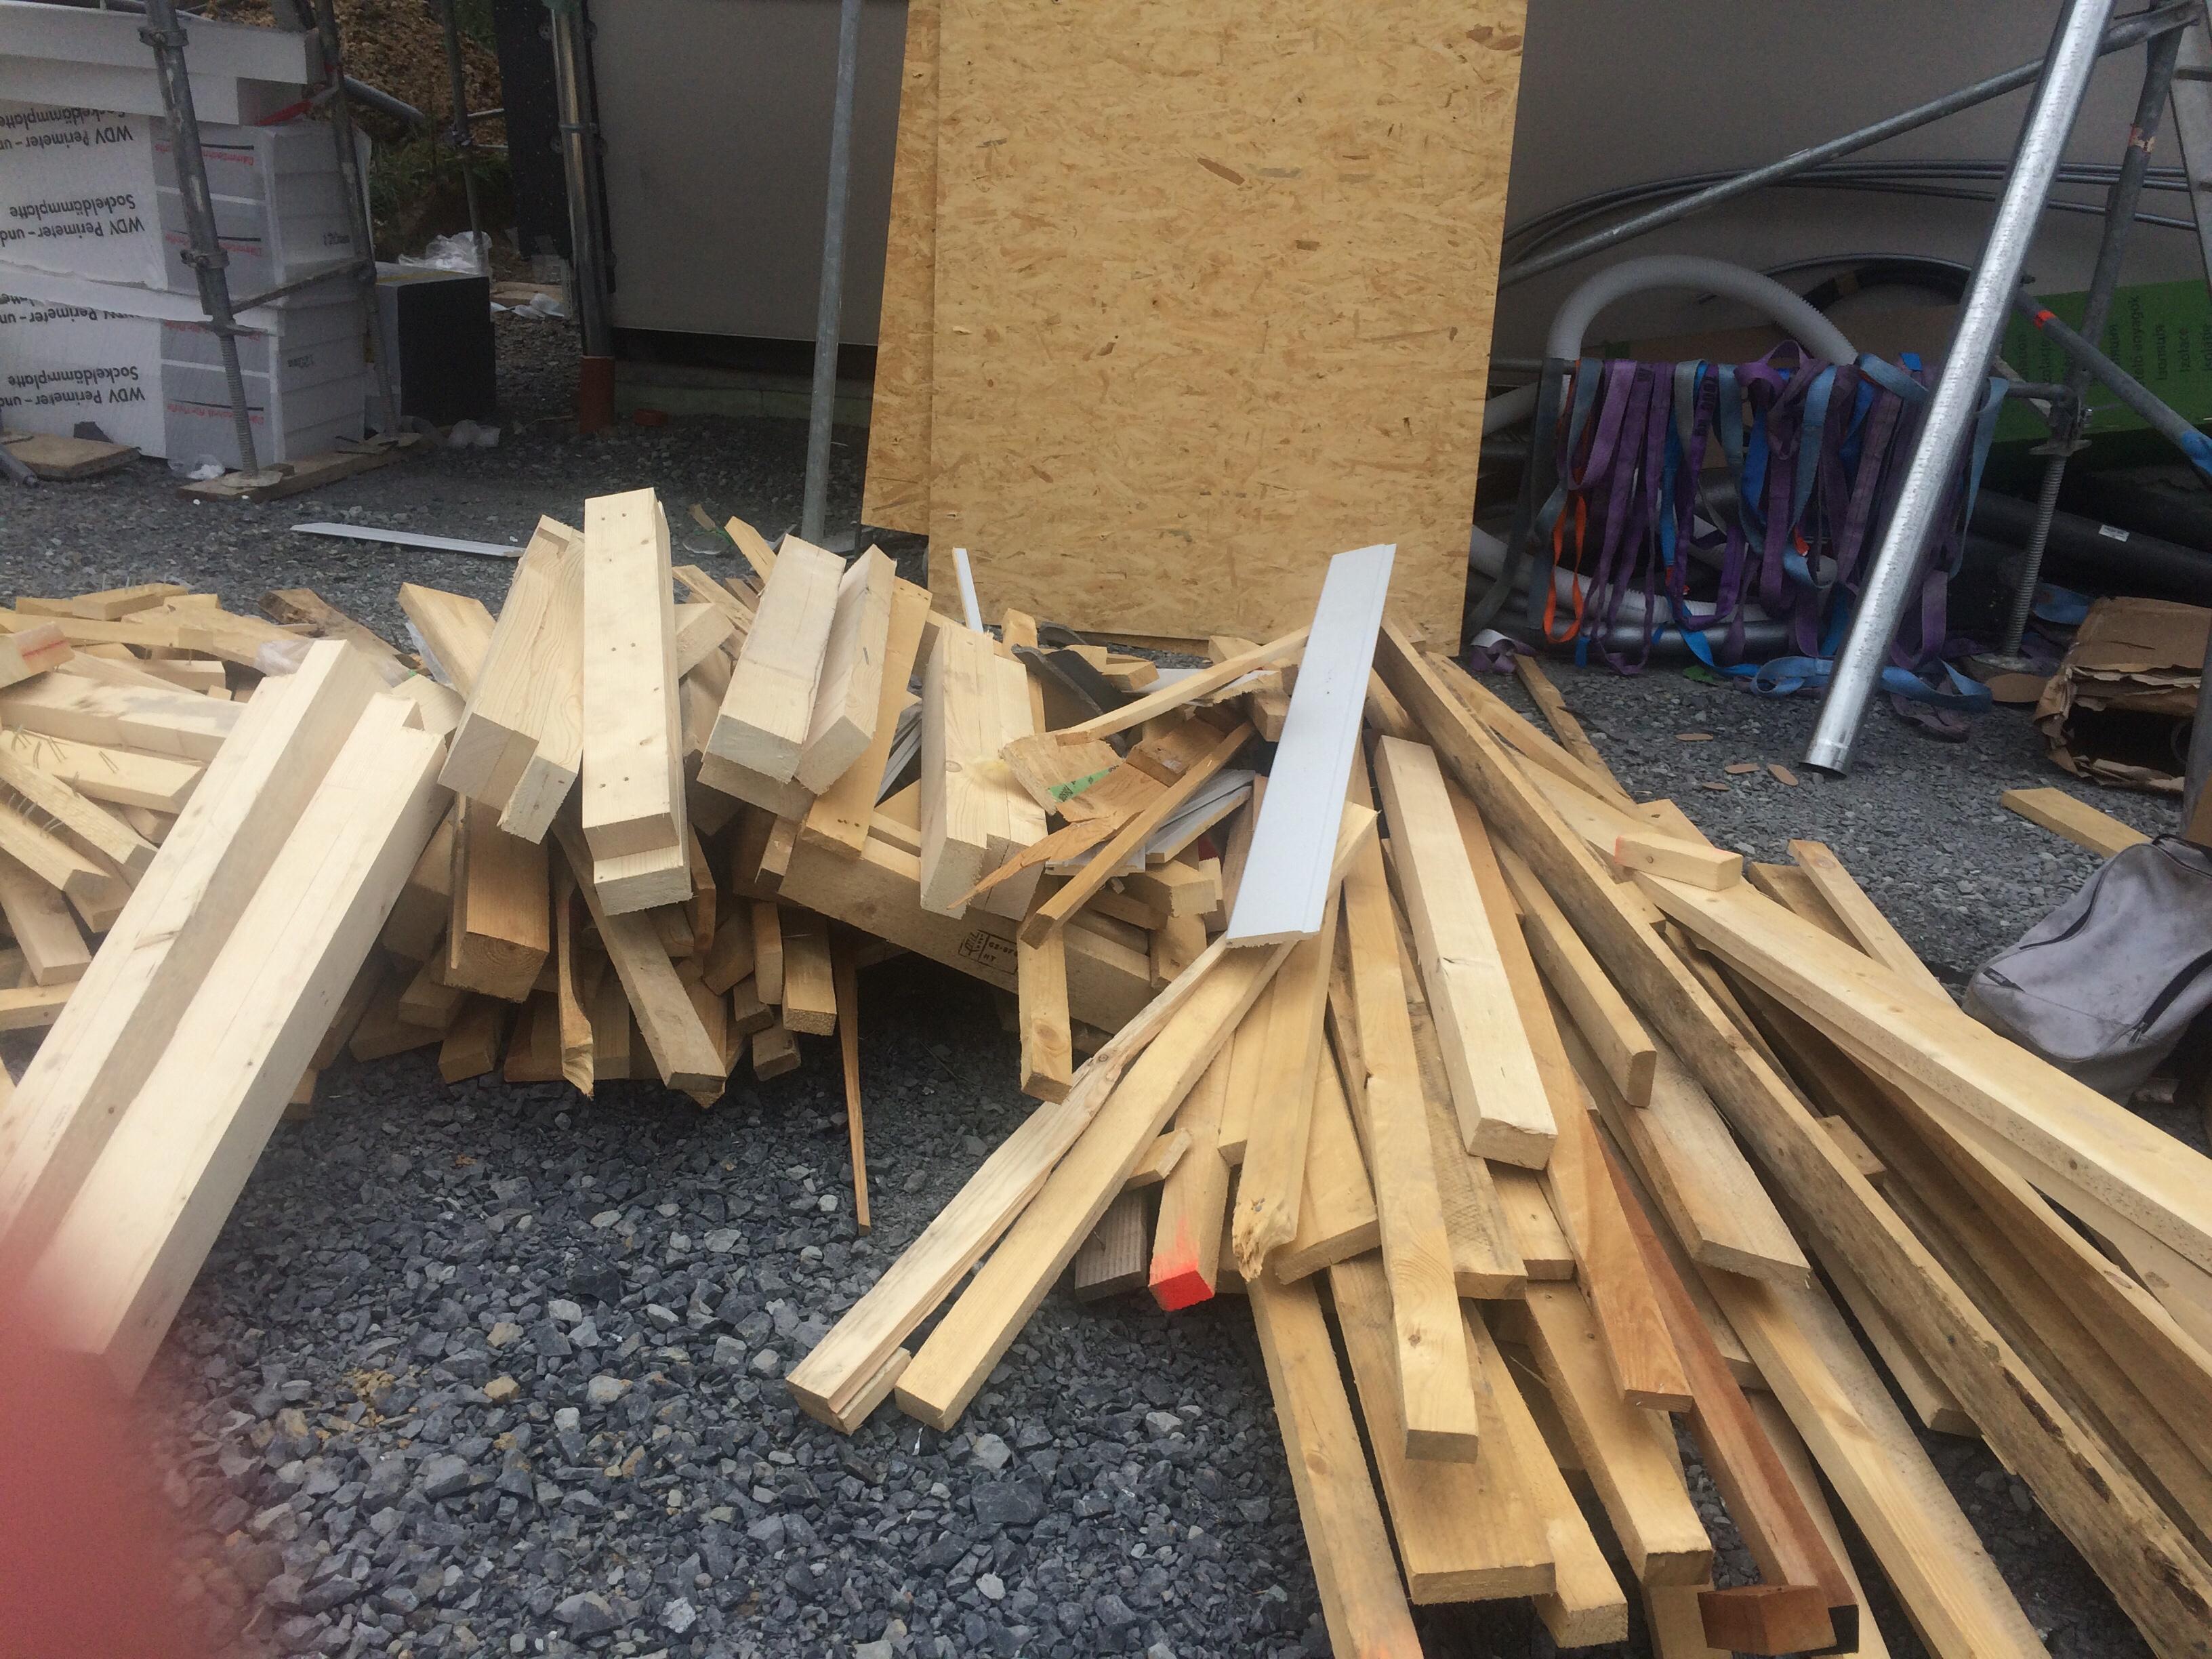 Holzreste vor dem Haus